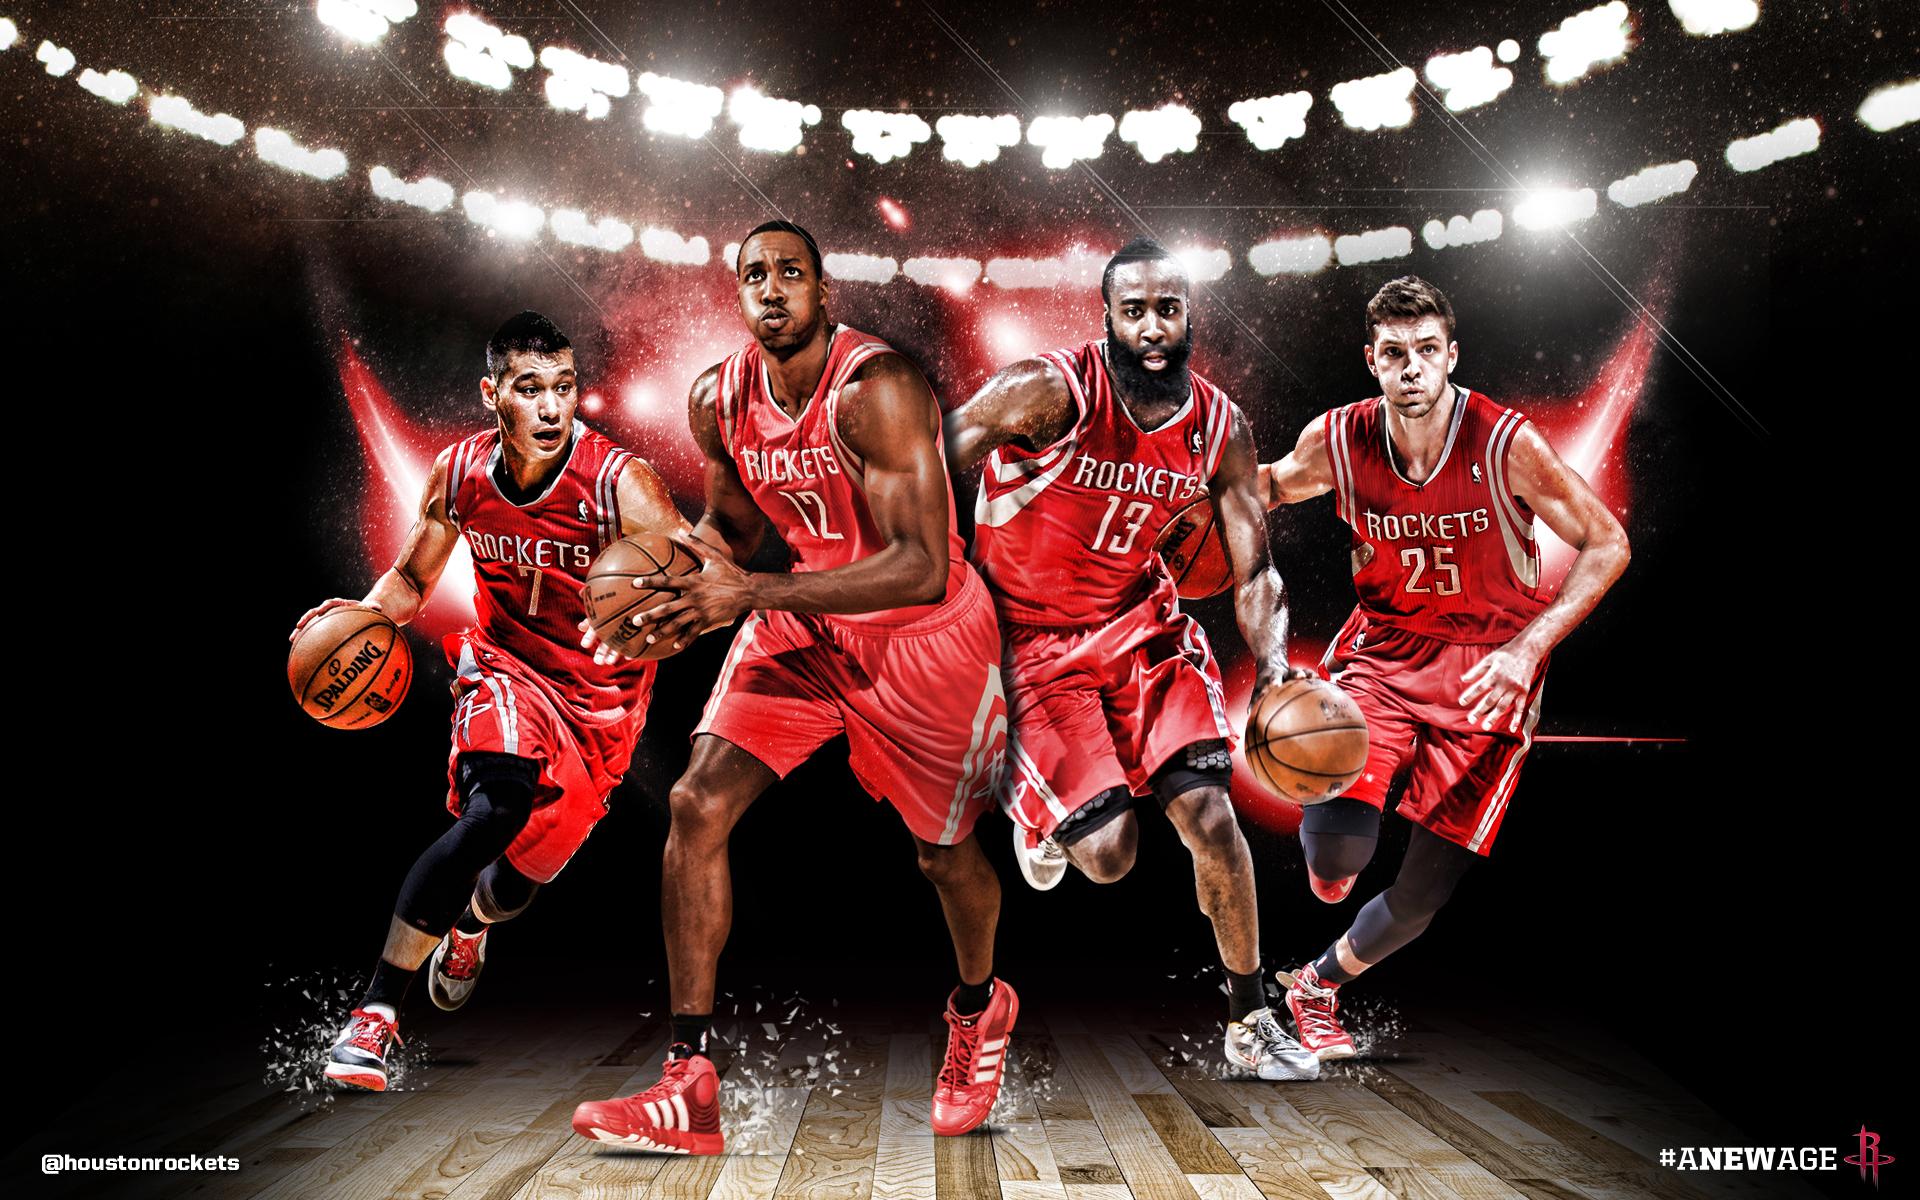 b84d38eb3 NBA teams set on League of Legends team names